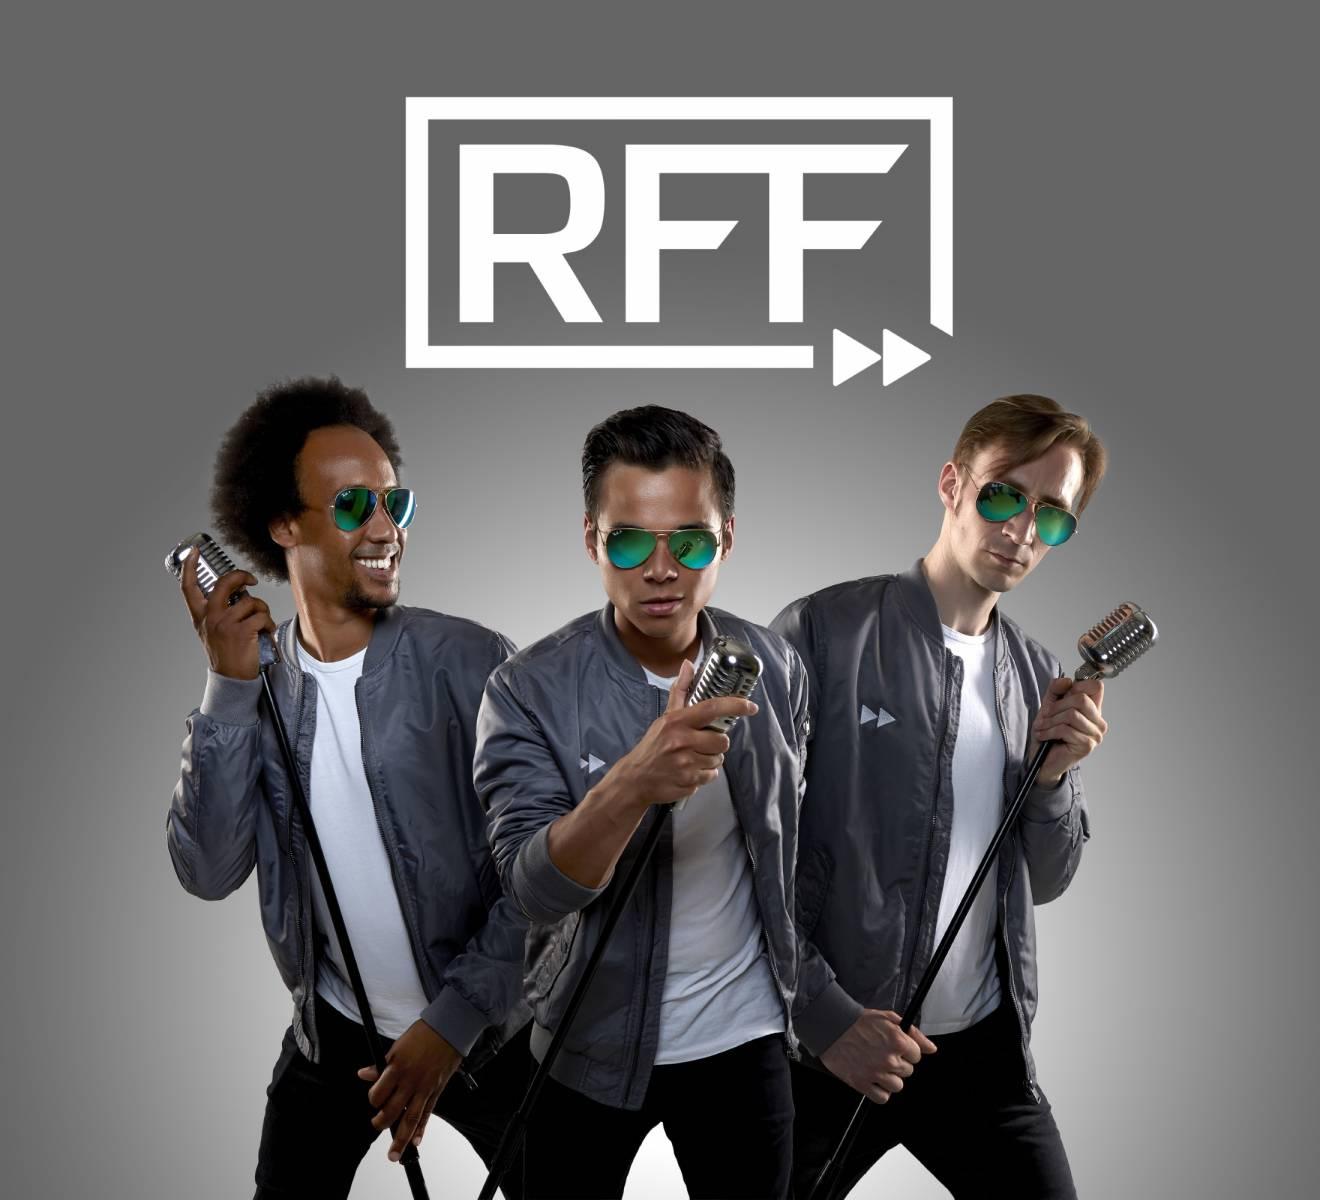 RFF artiest livemuziek entertainment house of events (1)